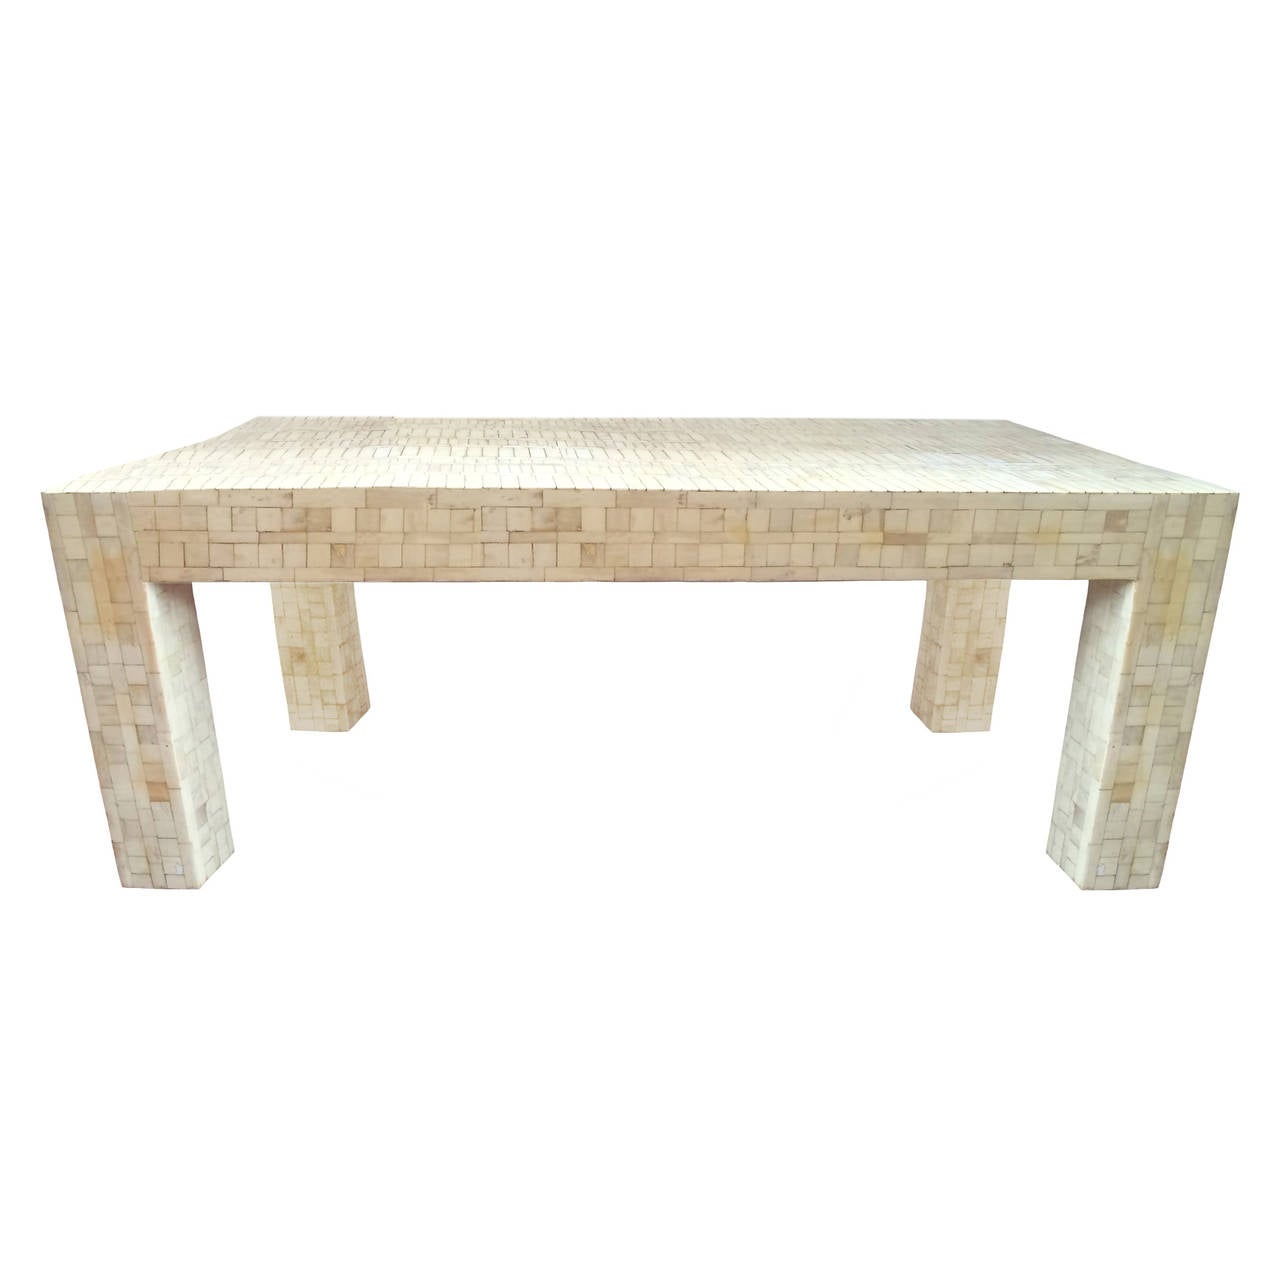 Joshua Bone Inlay Coffee Table: Jansen Bone Inlay Coffee Table At 1stdibs